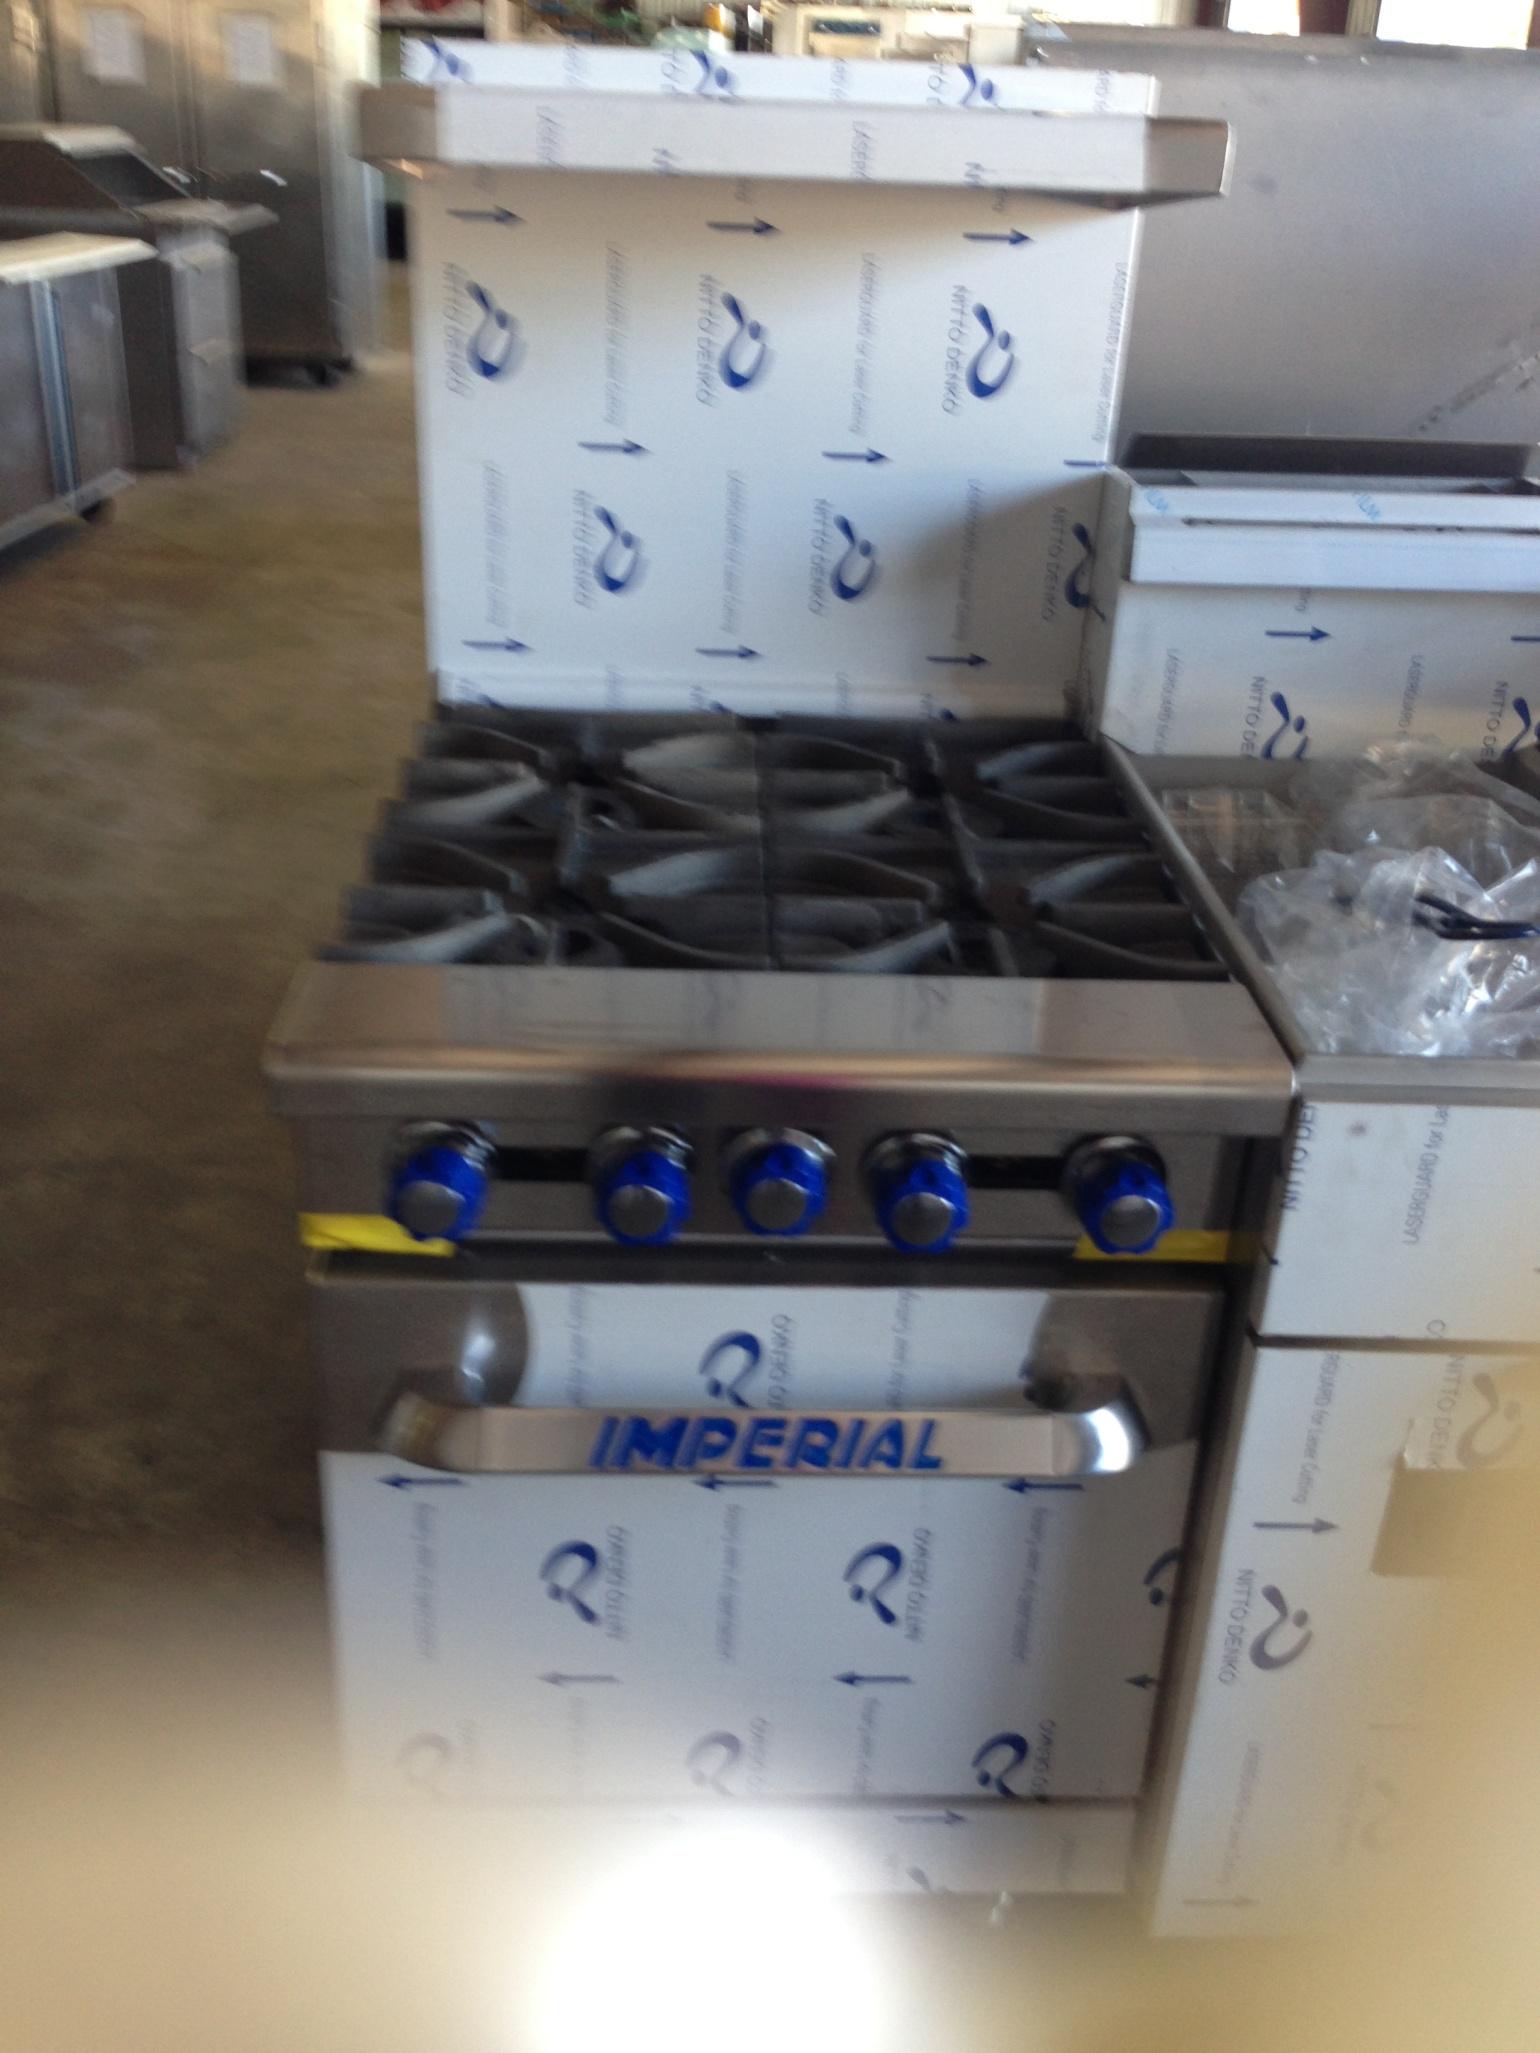 Imperial 4-burner range oven